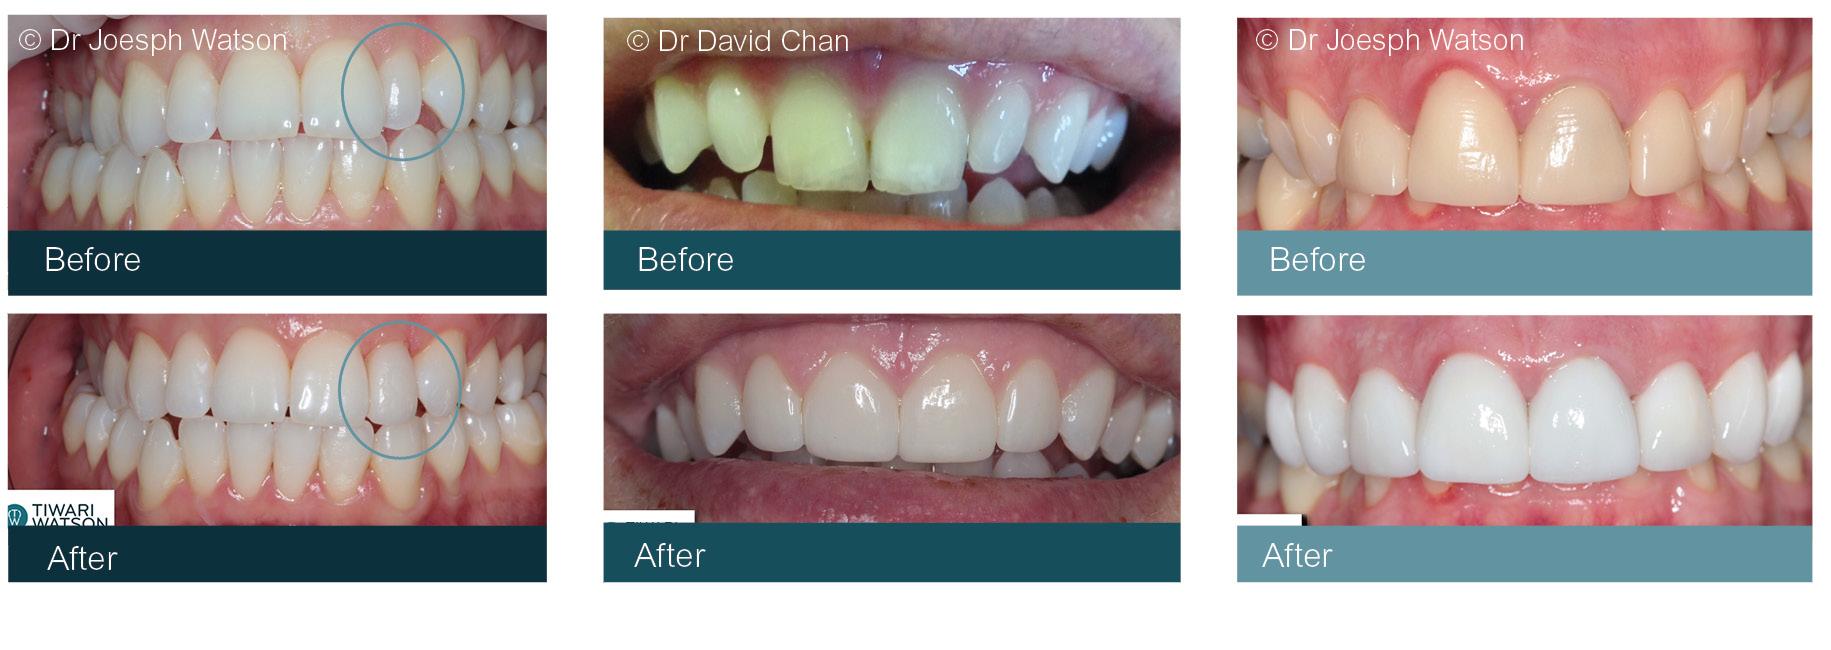 Cosmetic Dentistry Glasgow